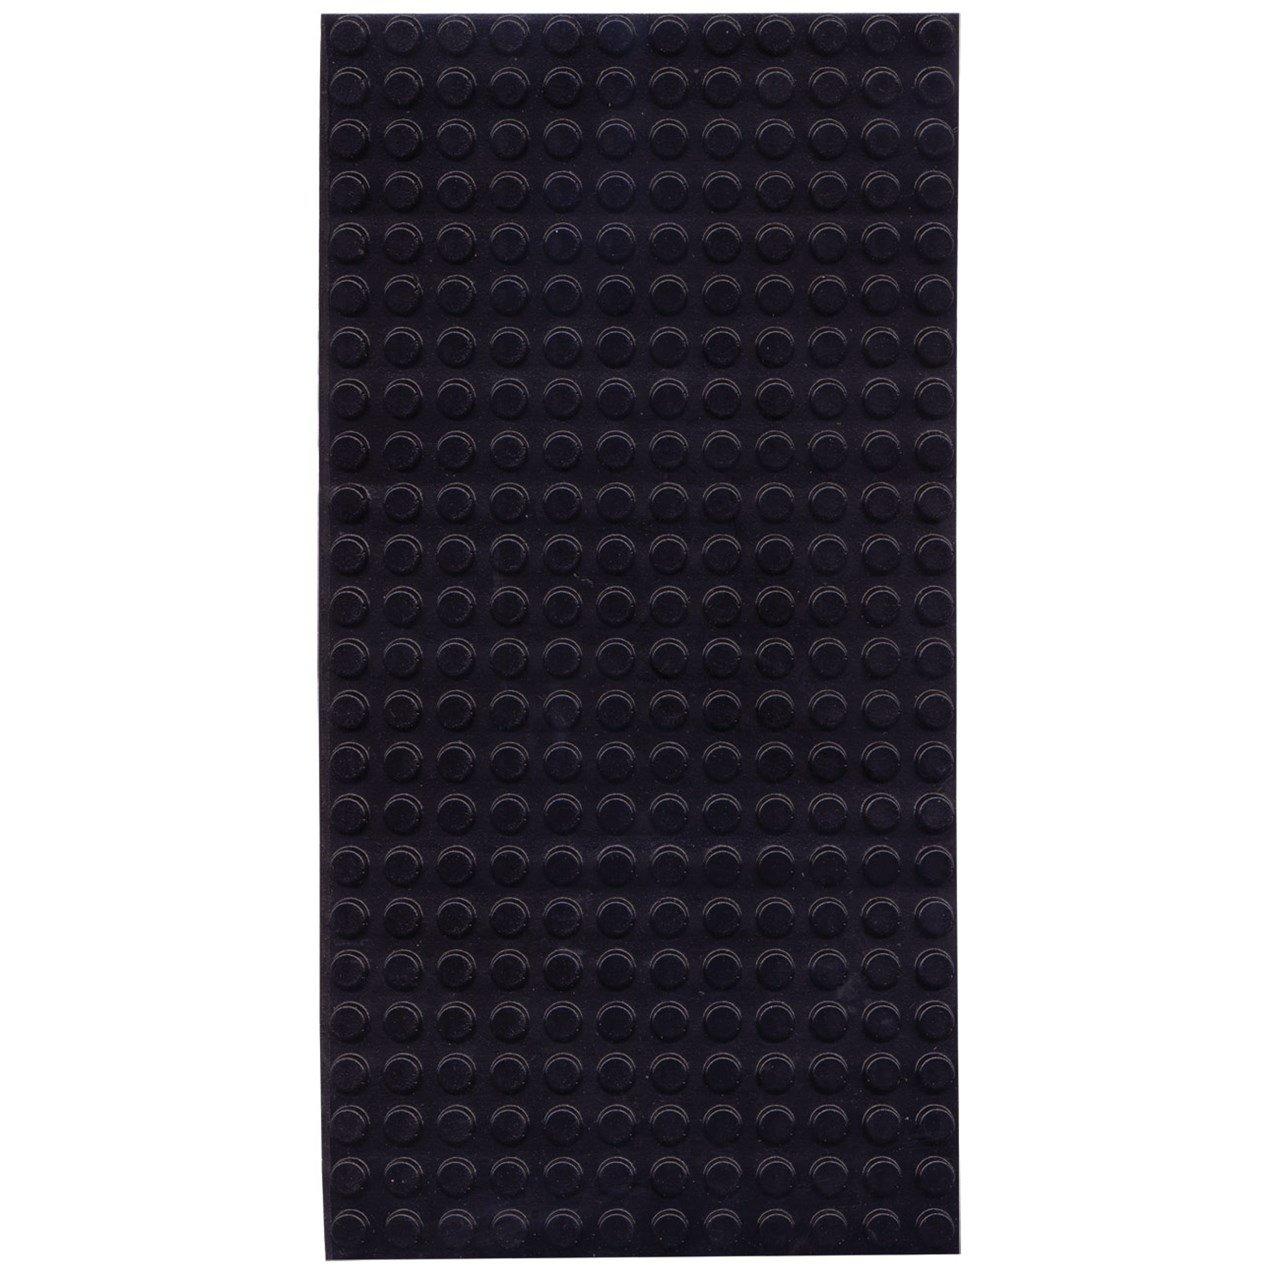 Bump Dots- Round-Flat Top-Black-Medium-300pk